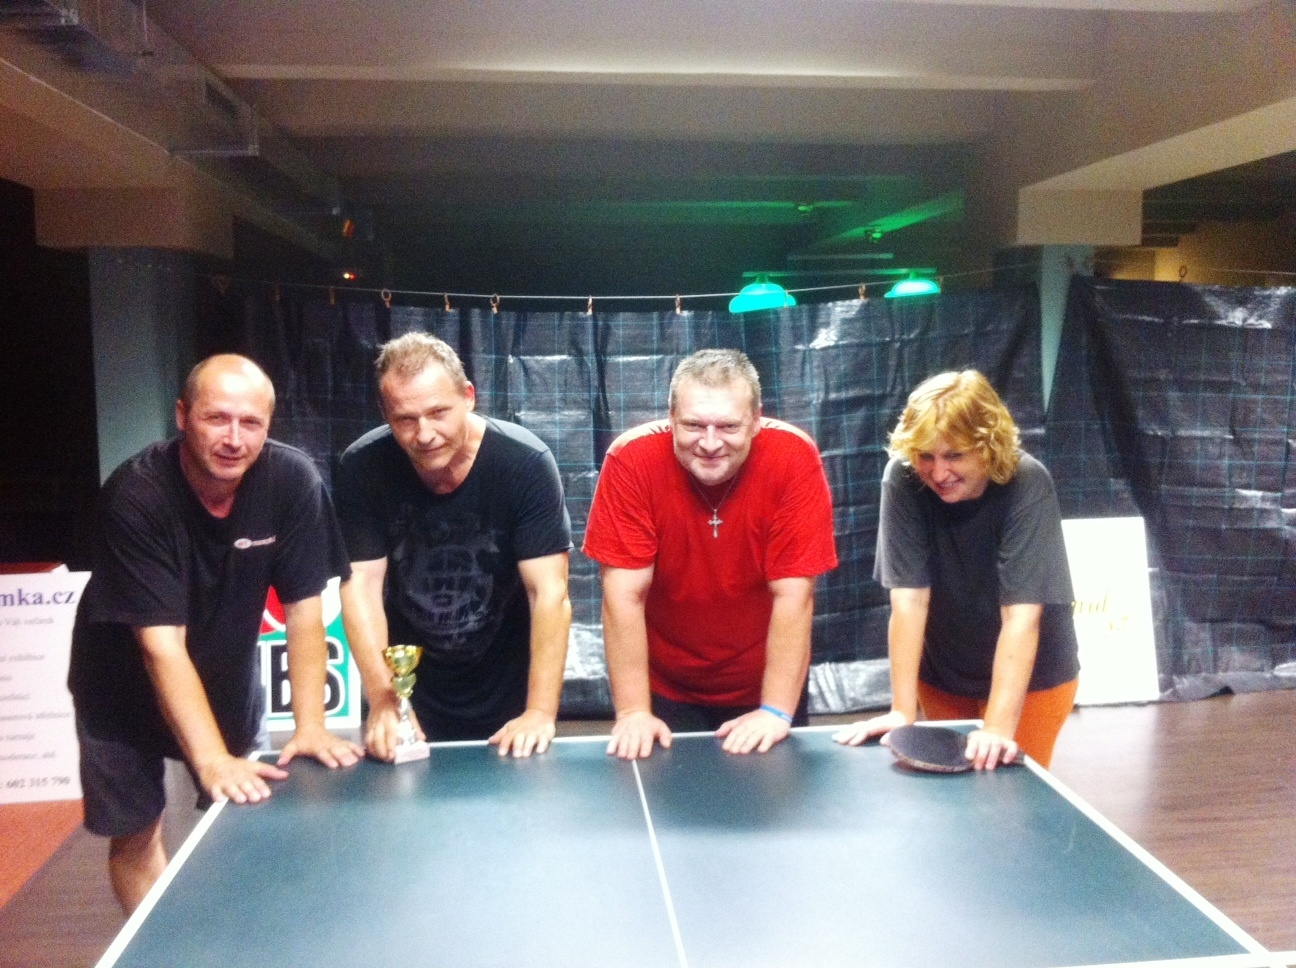 Vítěz Zdeněk Tschunko, zleva Josef Tschunko, Zdeněk, Courton a Bohdana Holá